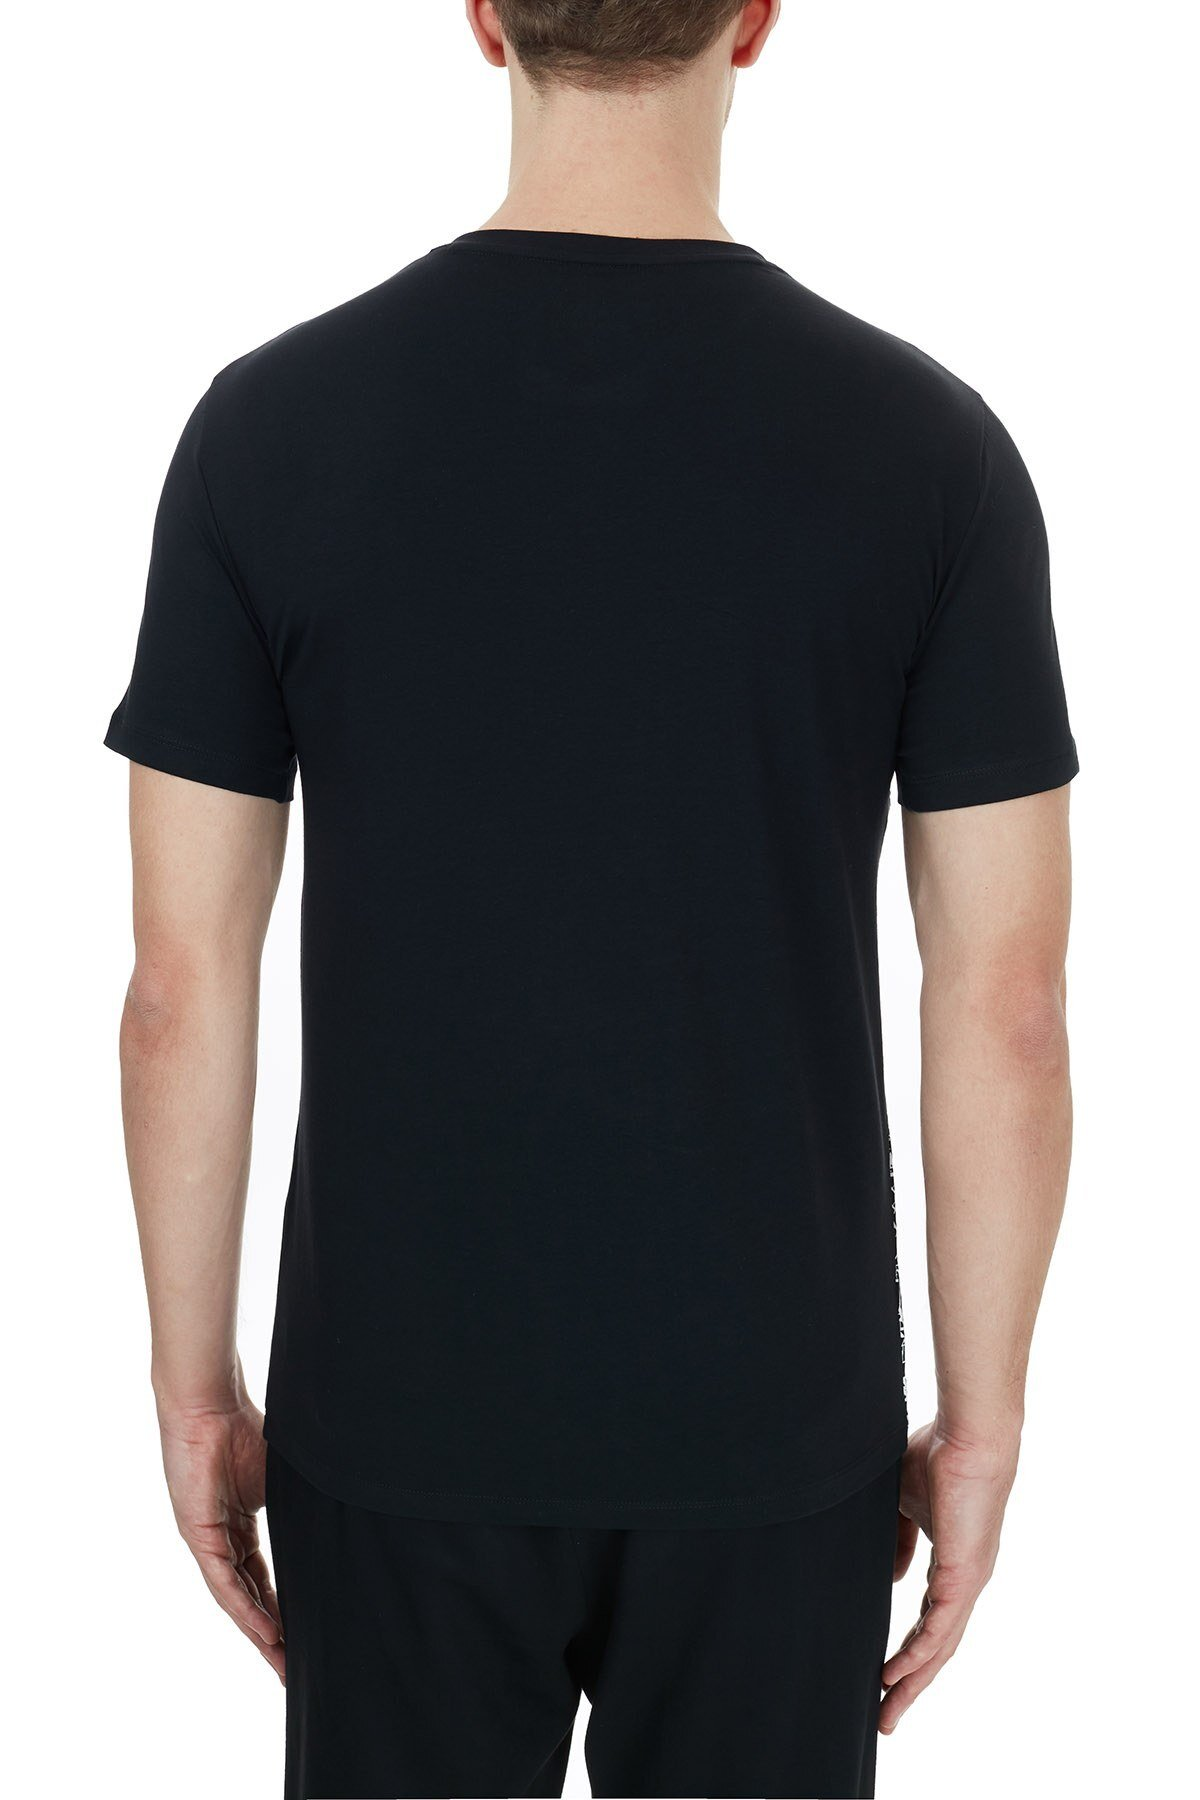 Armani Exchange Pamuklu V Yaka Erkek T Shirt 6HZTFN ZJE6Z 7255 SİYAH